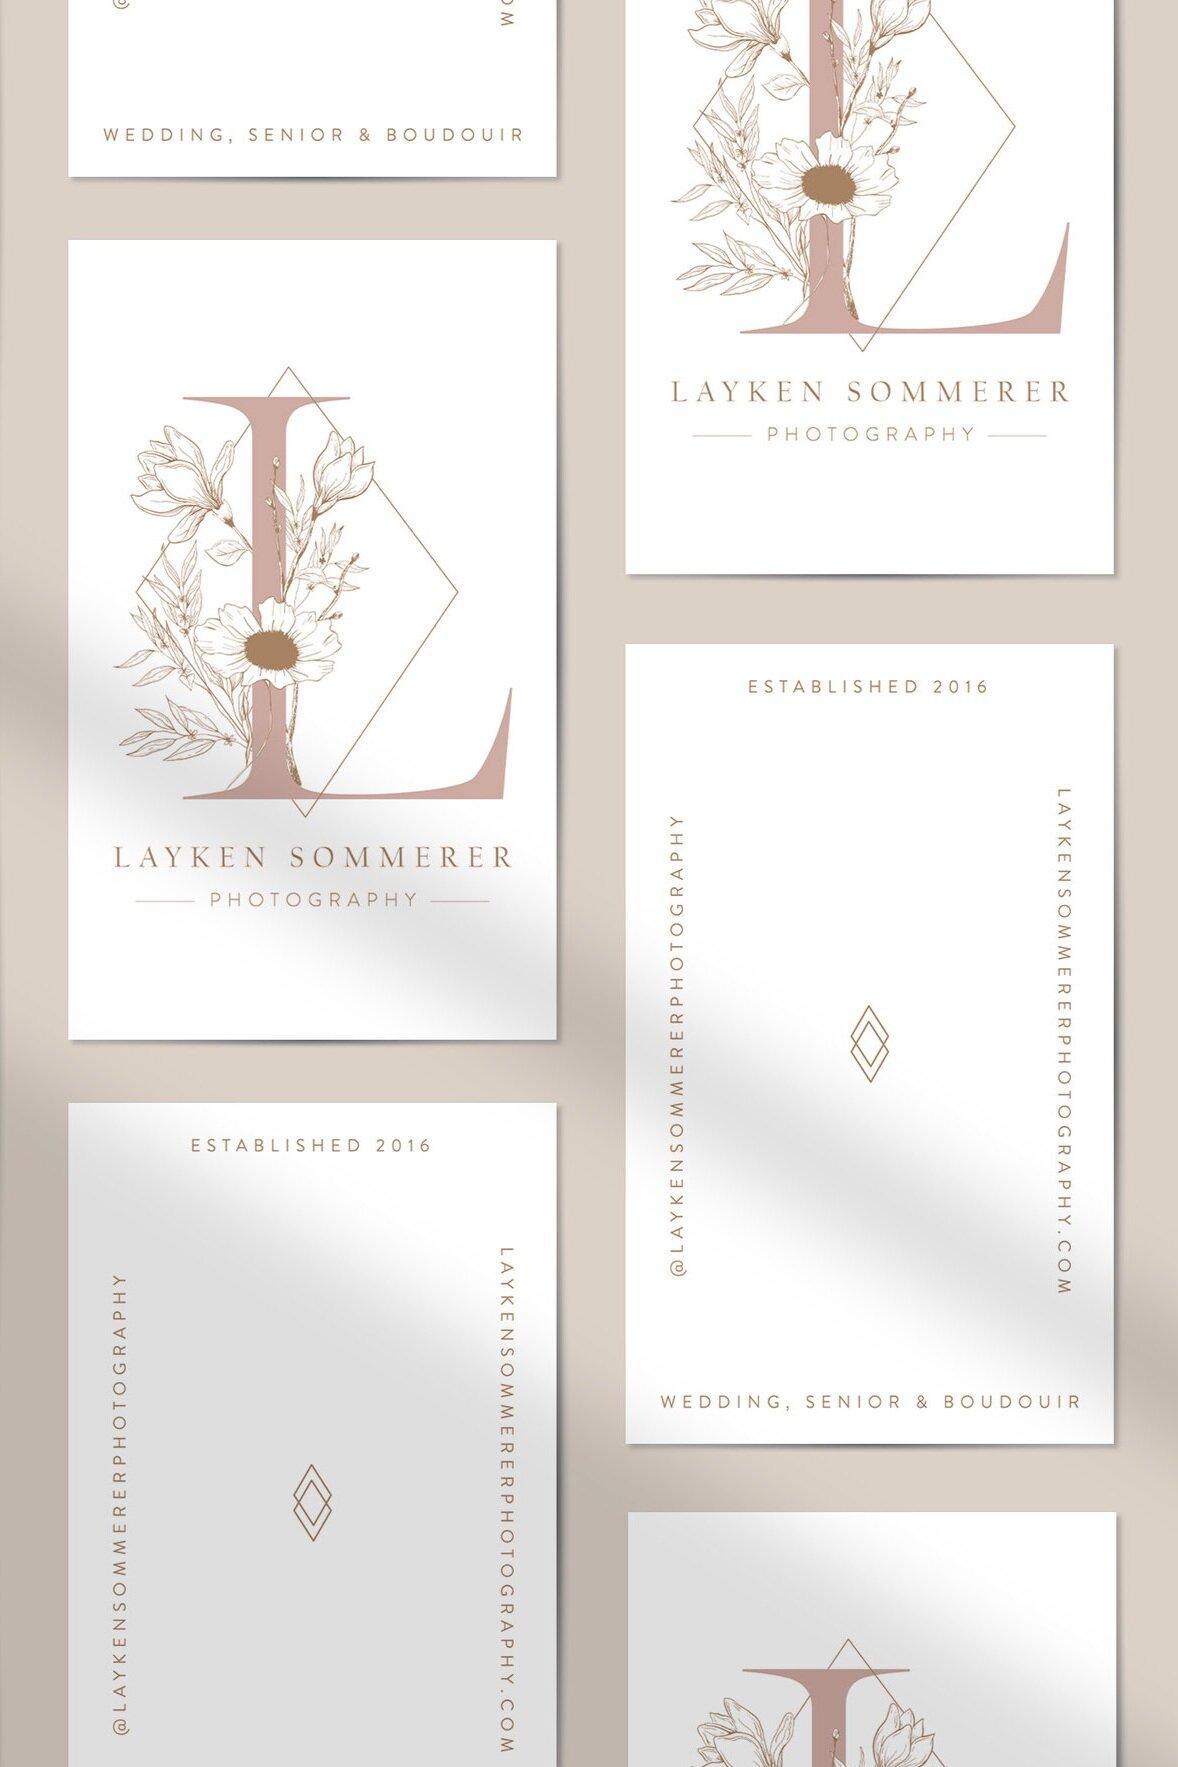 Layken-Sommerer-Biz-Card-Mockup-2.jpg